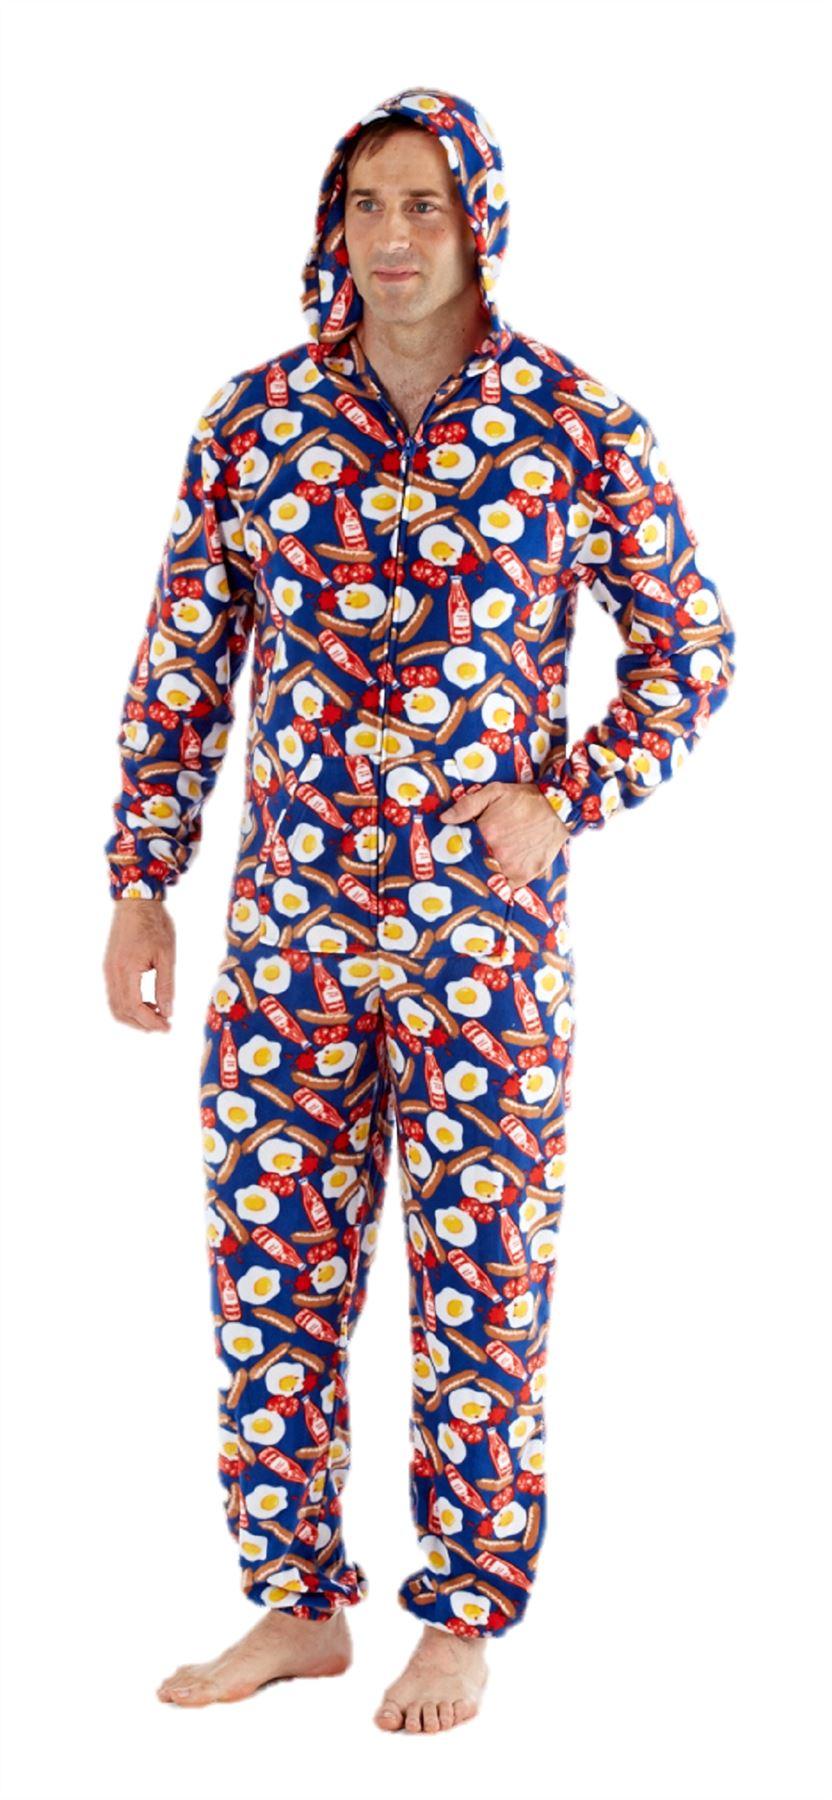 mens onesie all in one pyjama pajama one piece romper s m l breakfast ebay. Black Bedroom Furniture Sets. Home Design Ideas